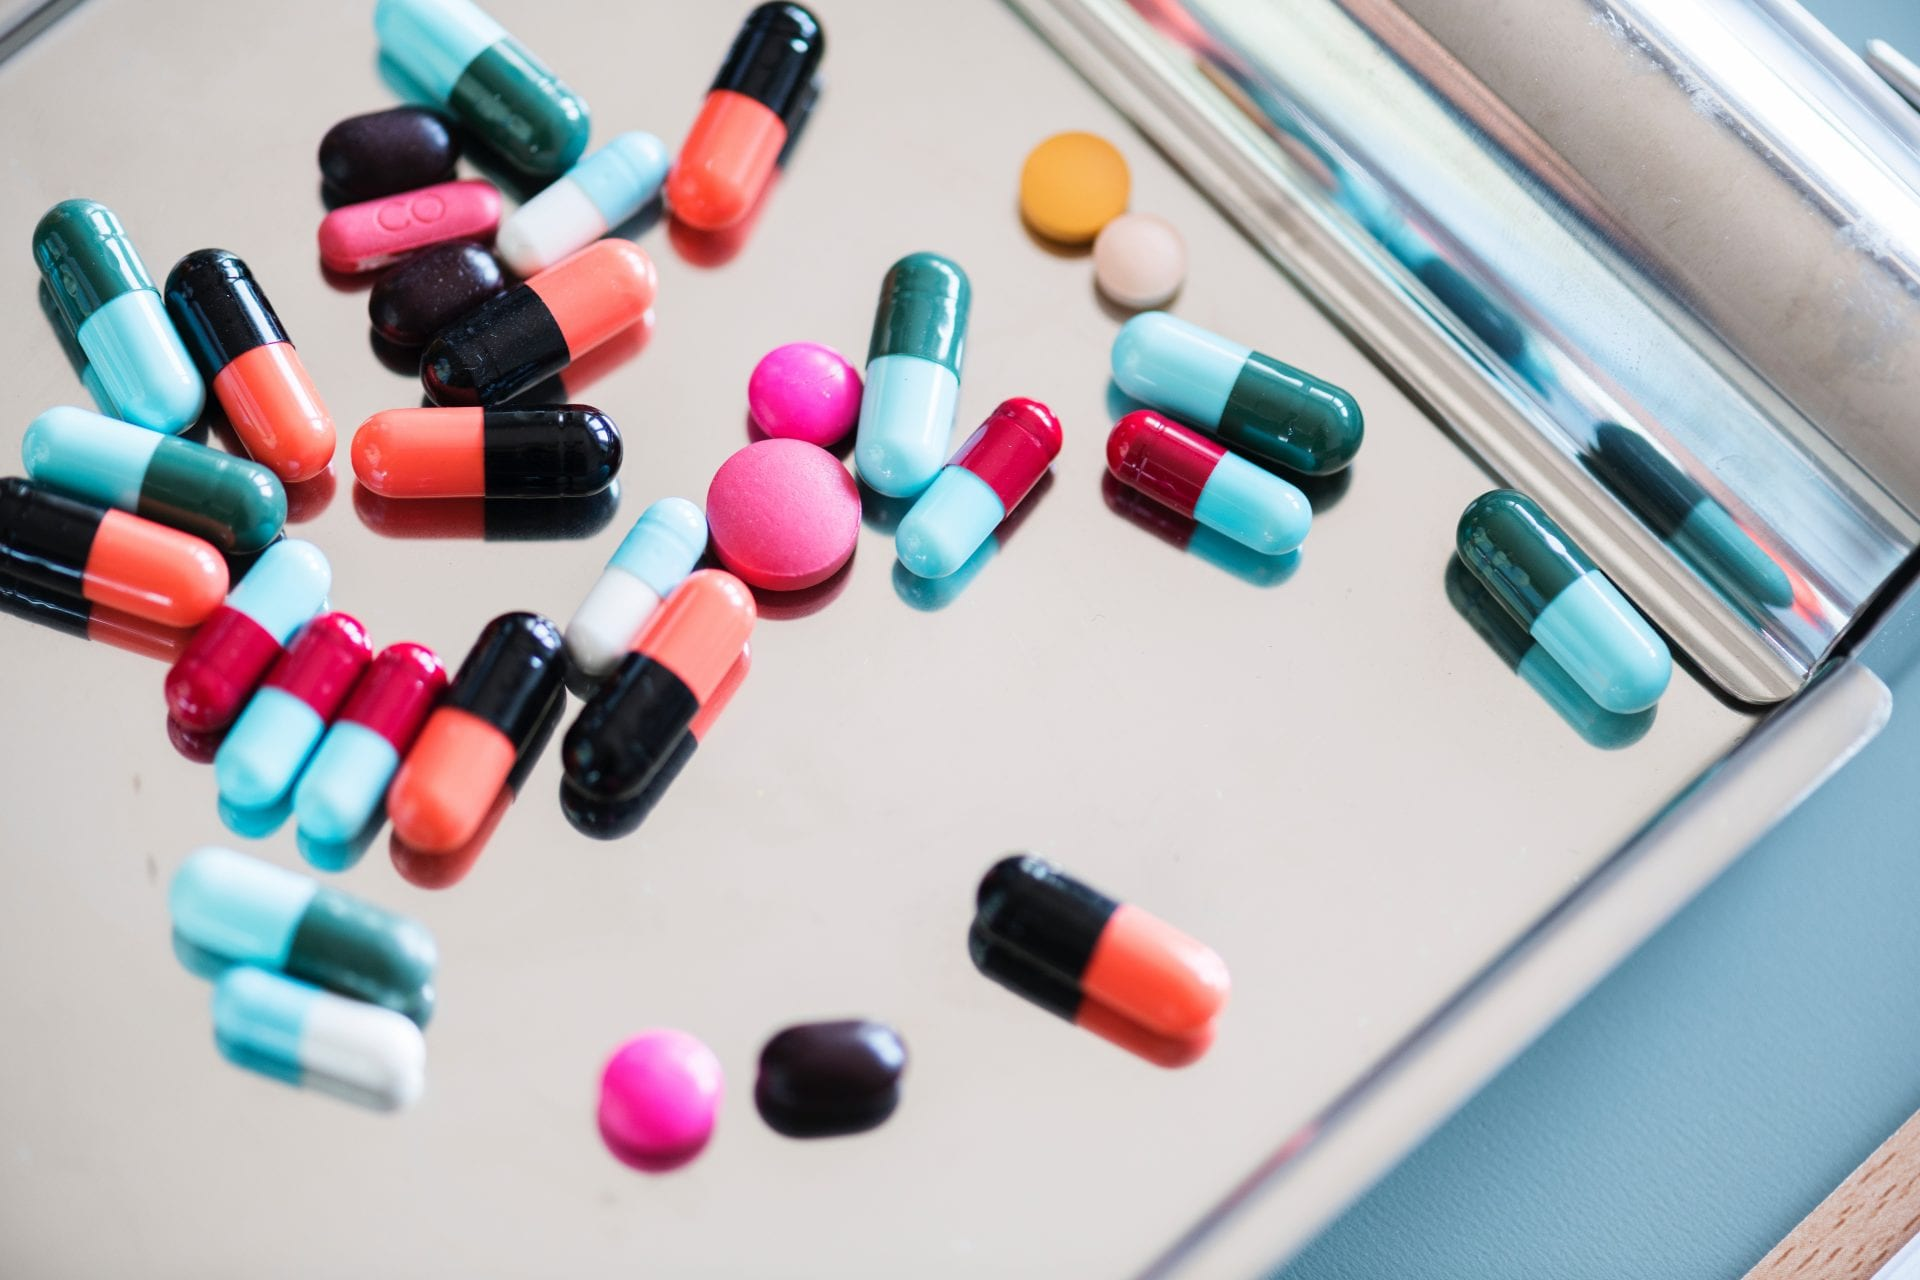 remedios efeitos sintomas abstinência drogas legais legalizadas remedios fala universidades